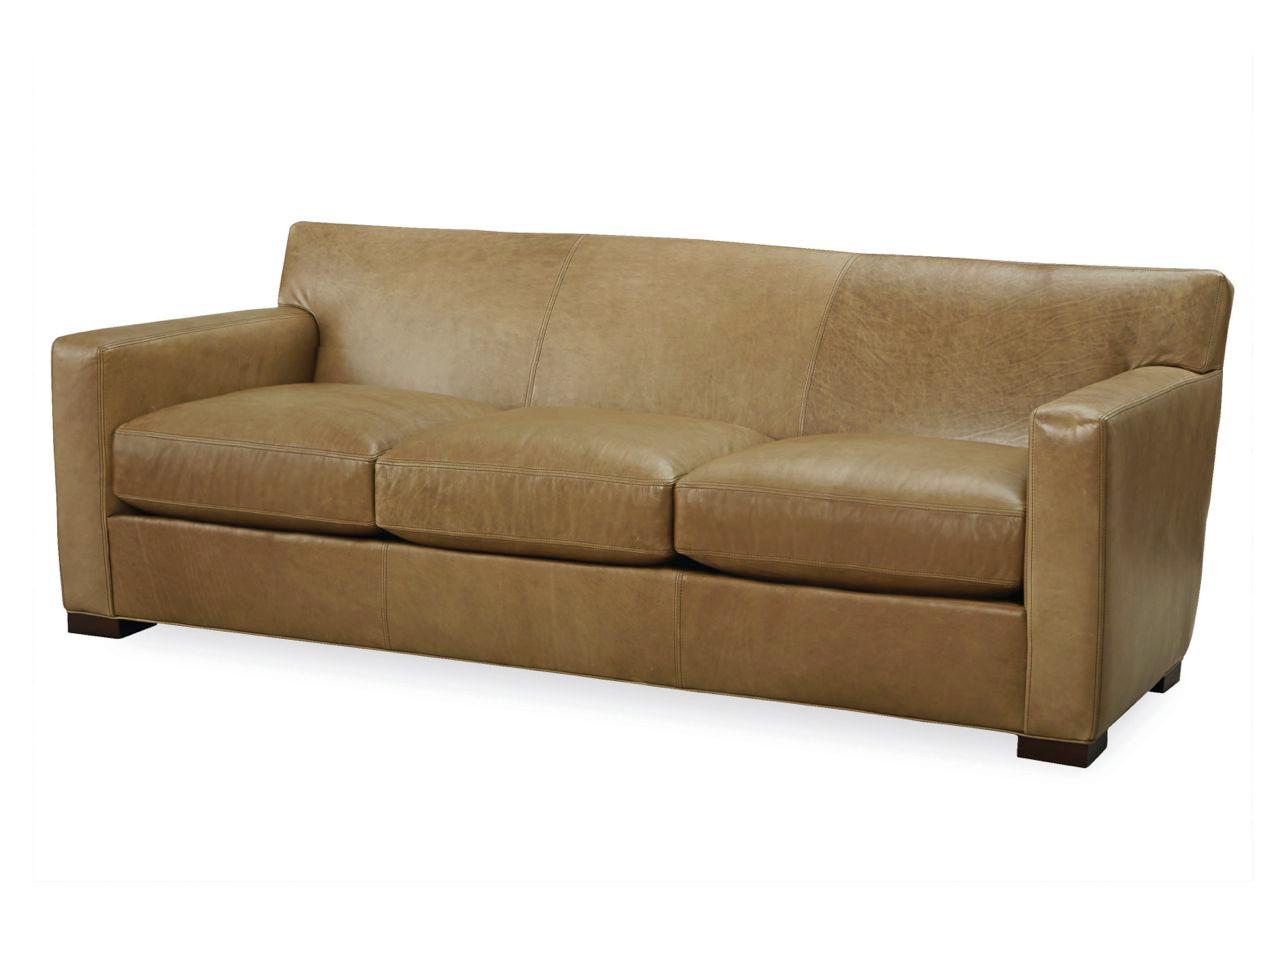 Theo Leather Queen Sleeper Leather Sleeper Sofas Sofa